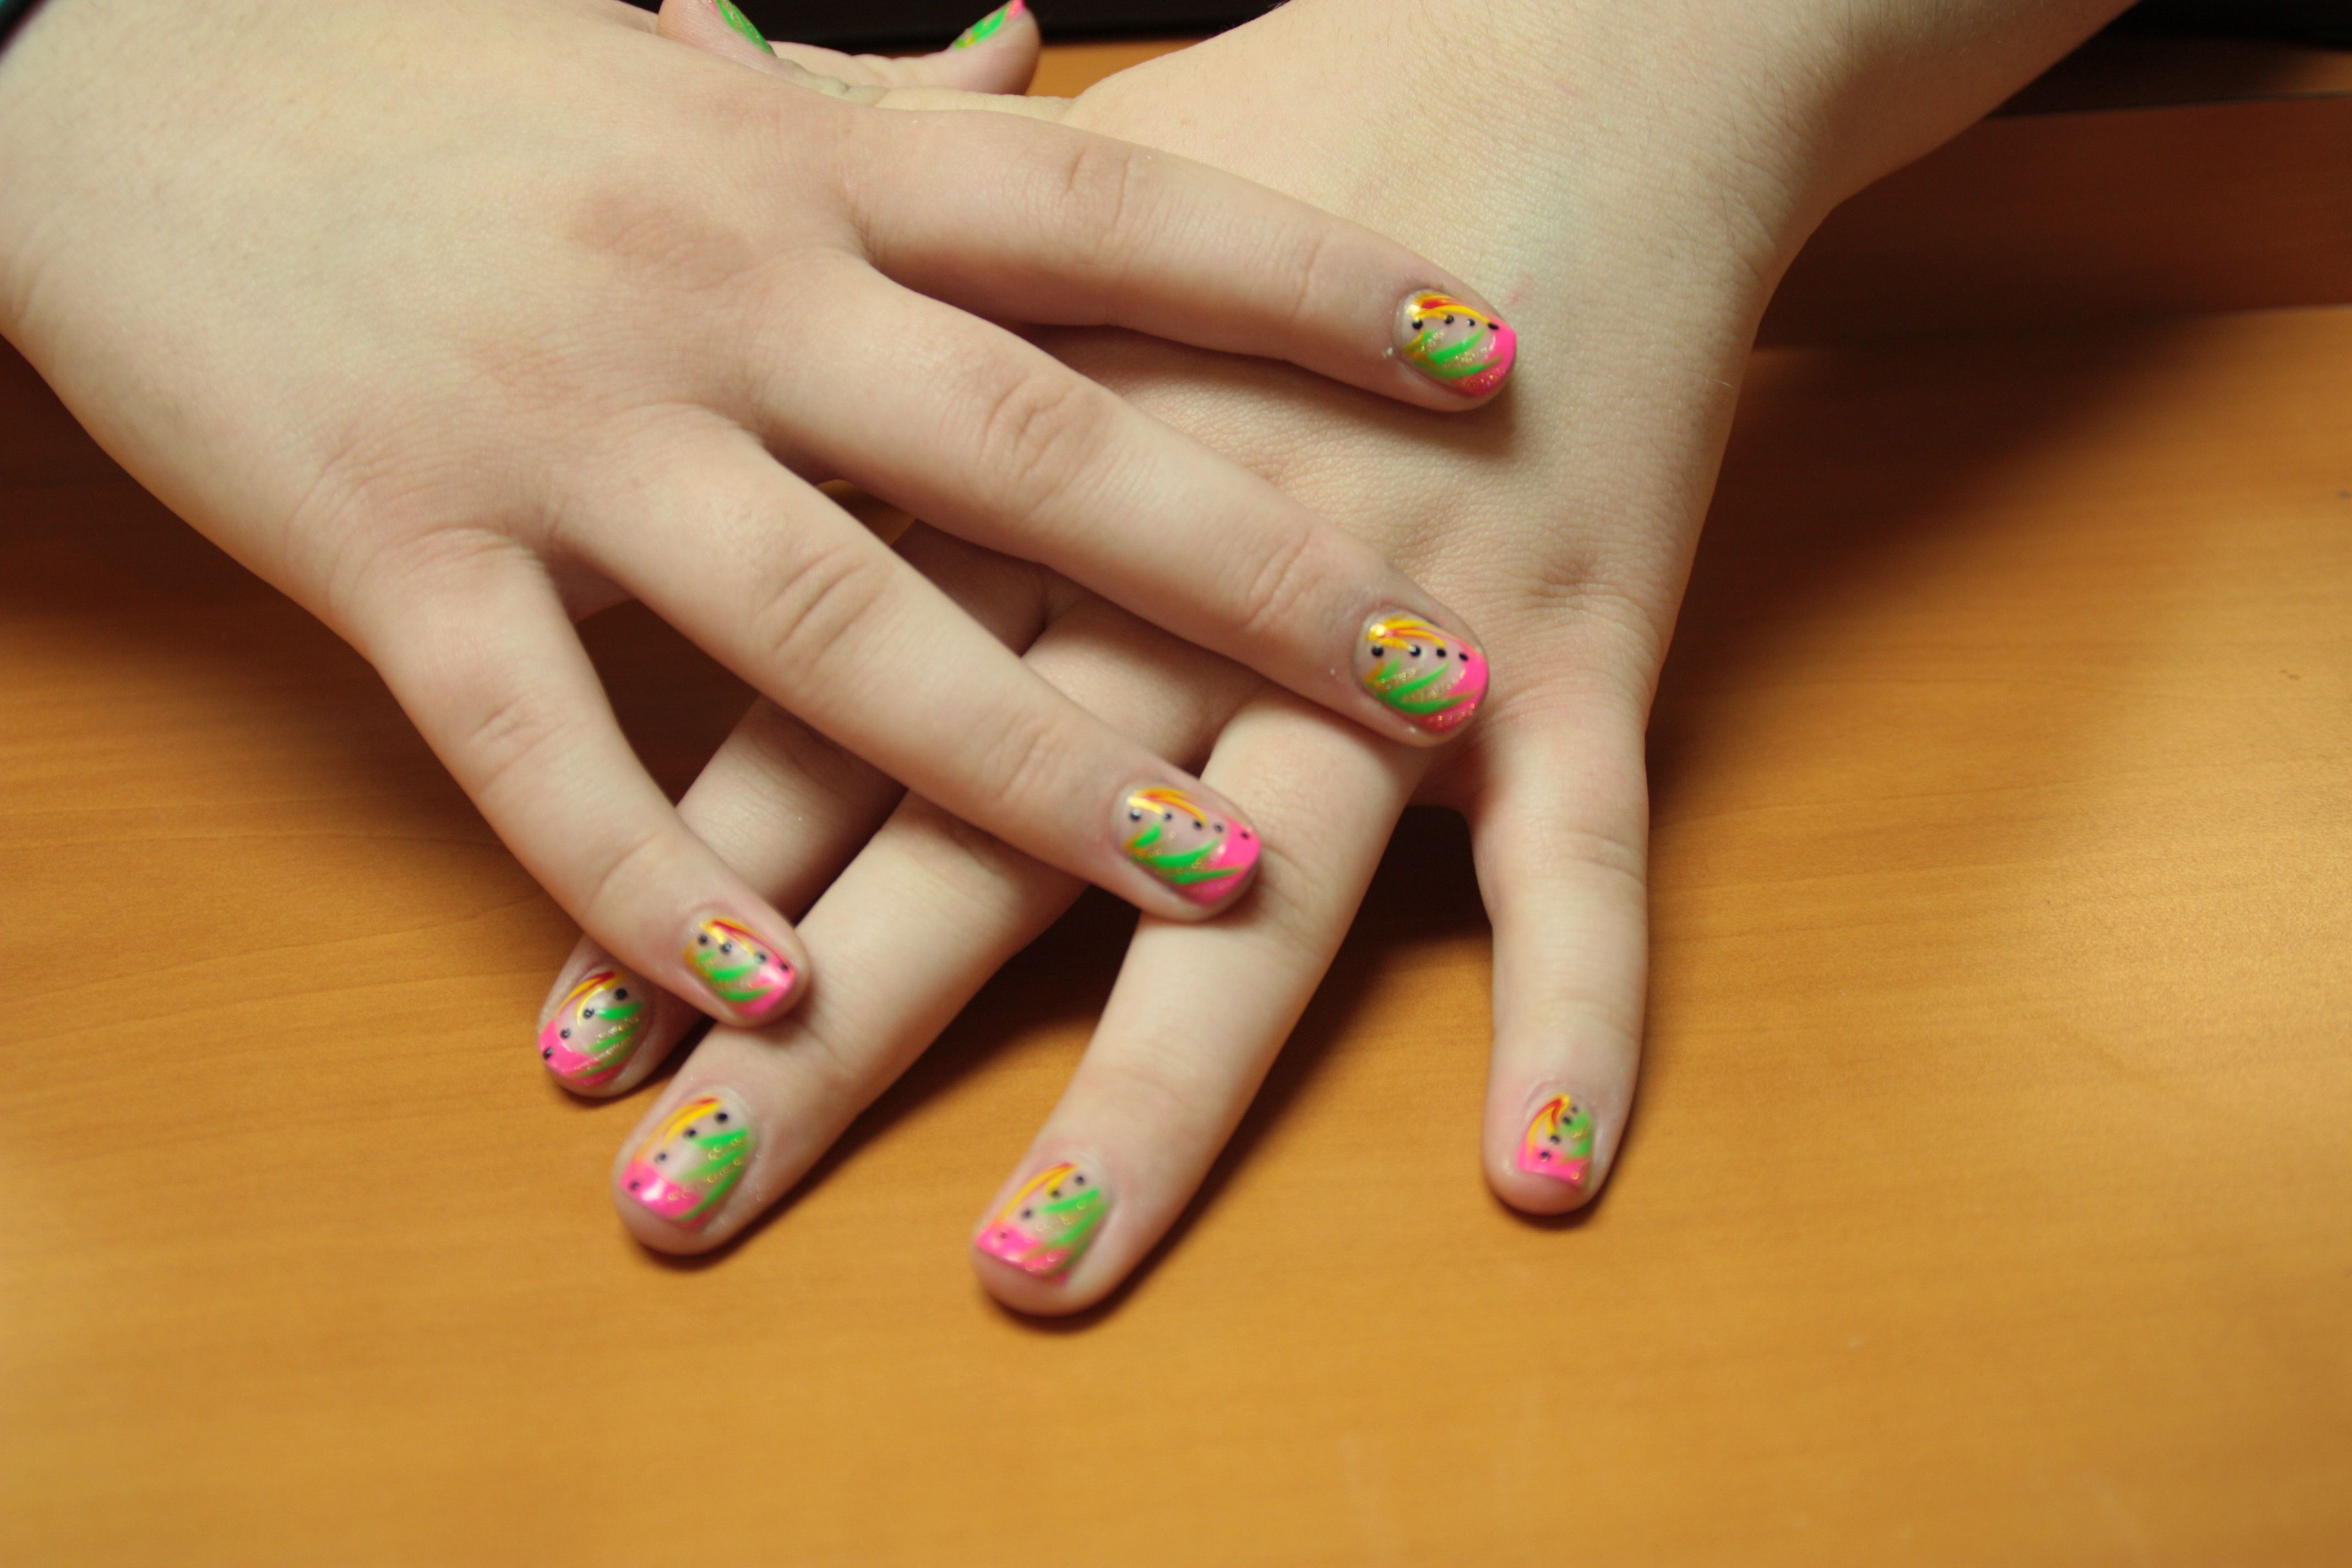 Amazing Nail Design Rainbow For Kids - http://nailarting.com/amazing ...